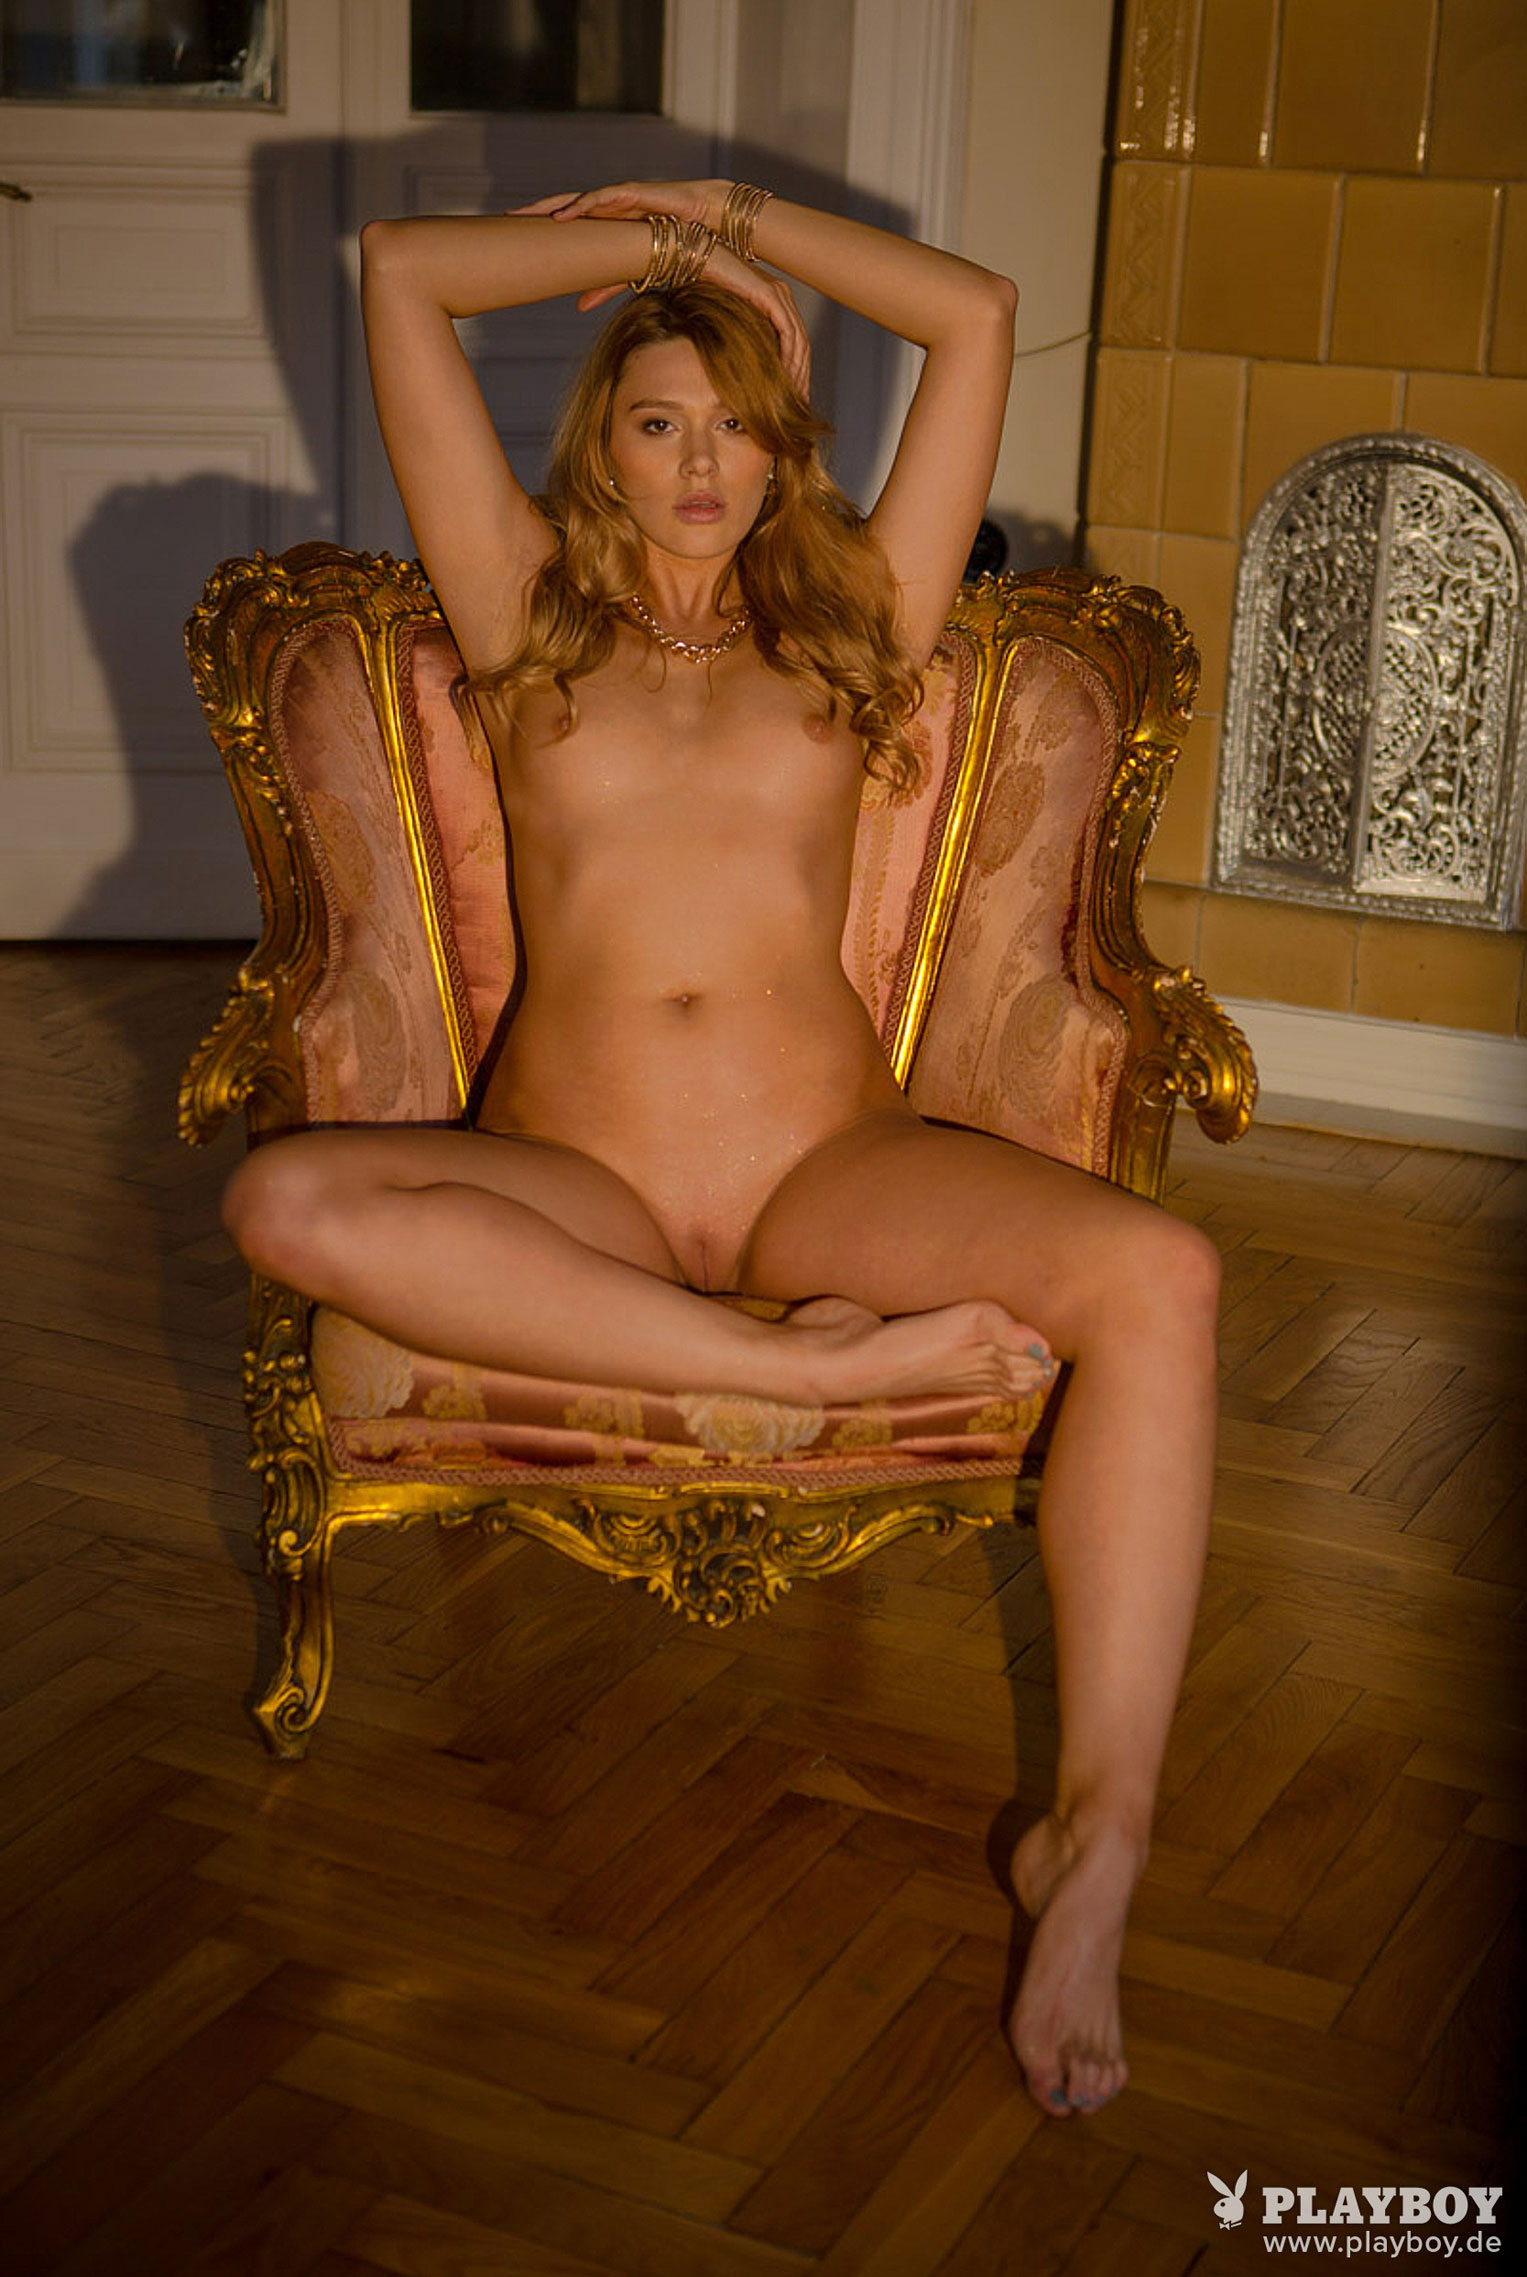 Девушка месяца Playboy Германия декабрь 2019 - Лена Беднарска / фото 16